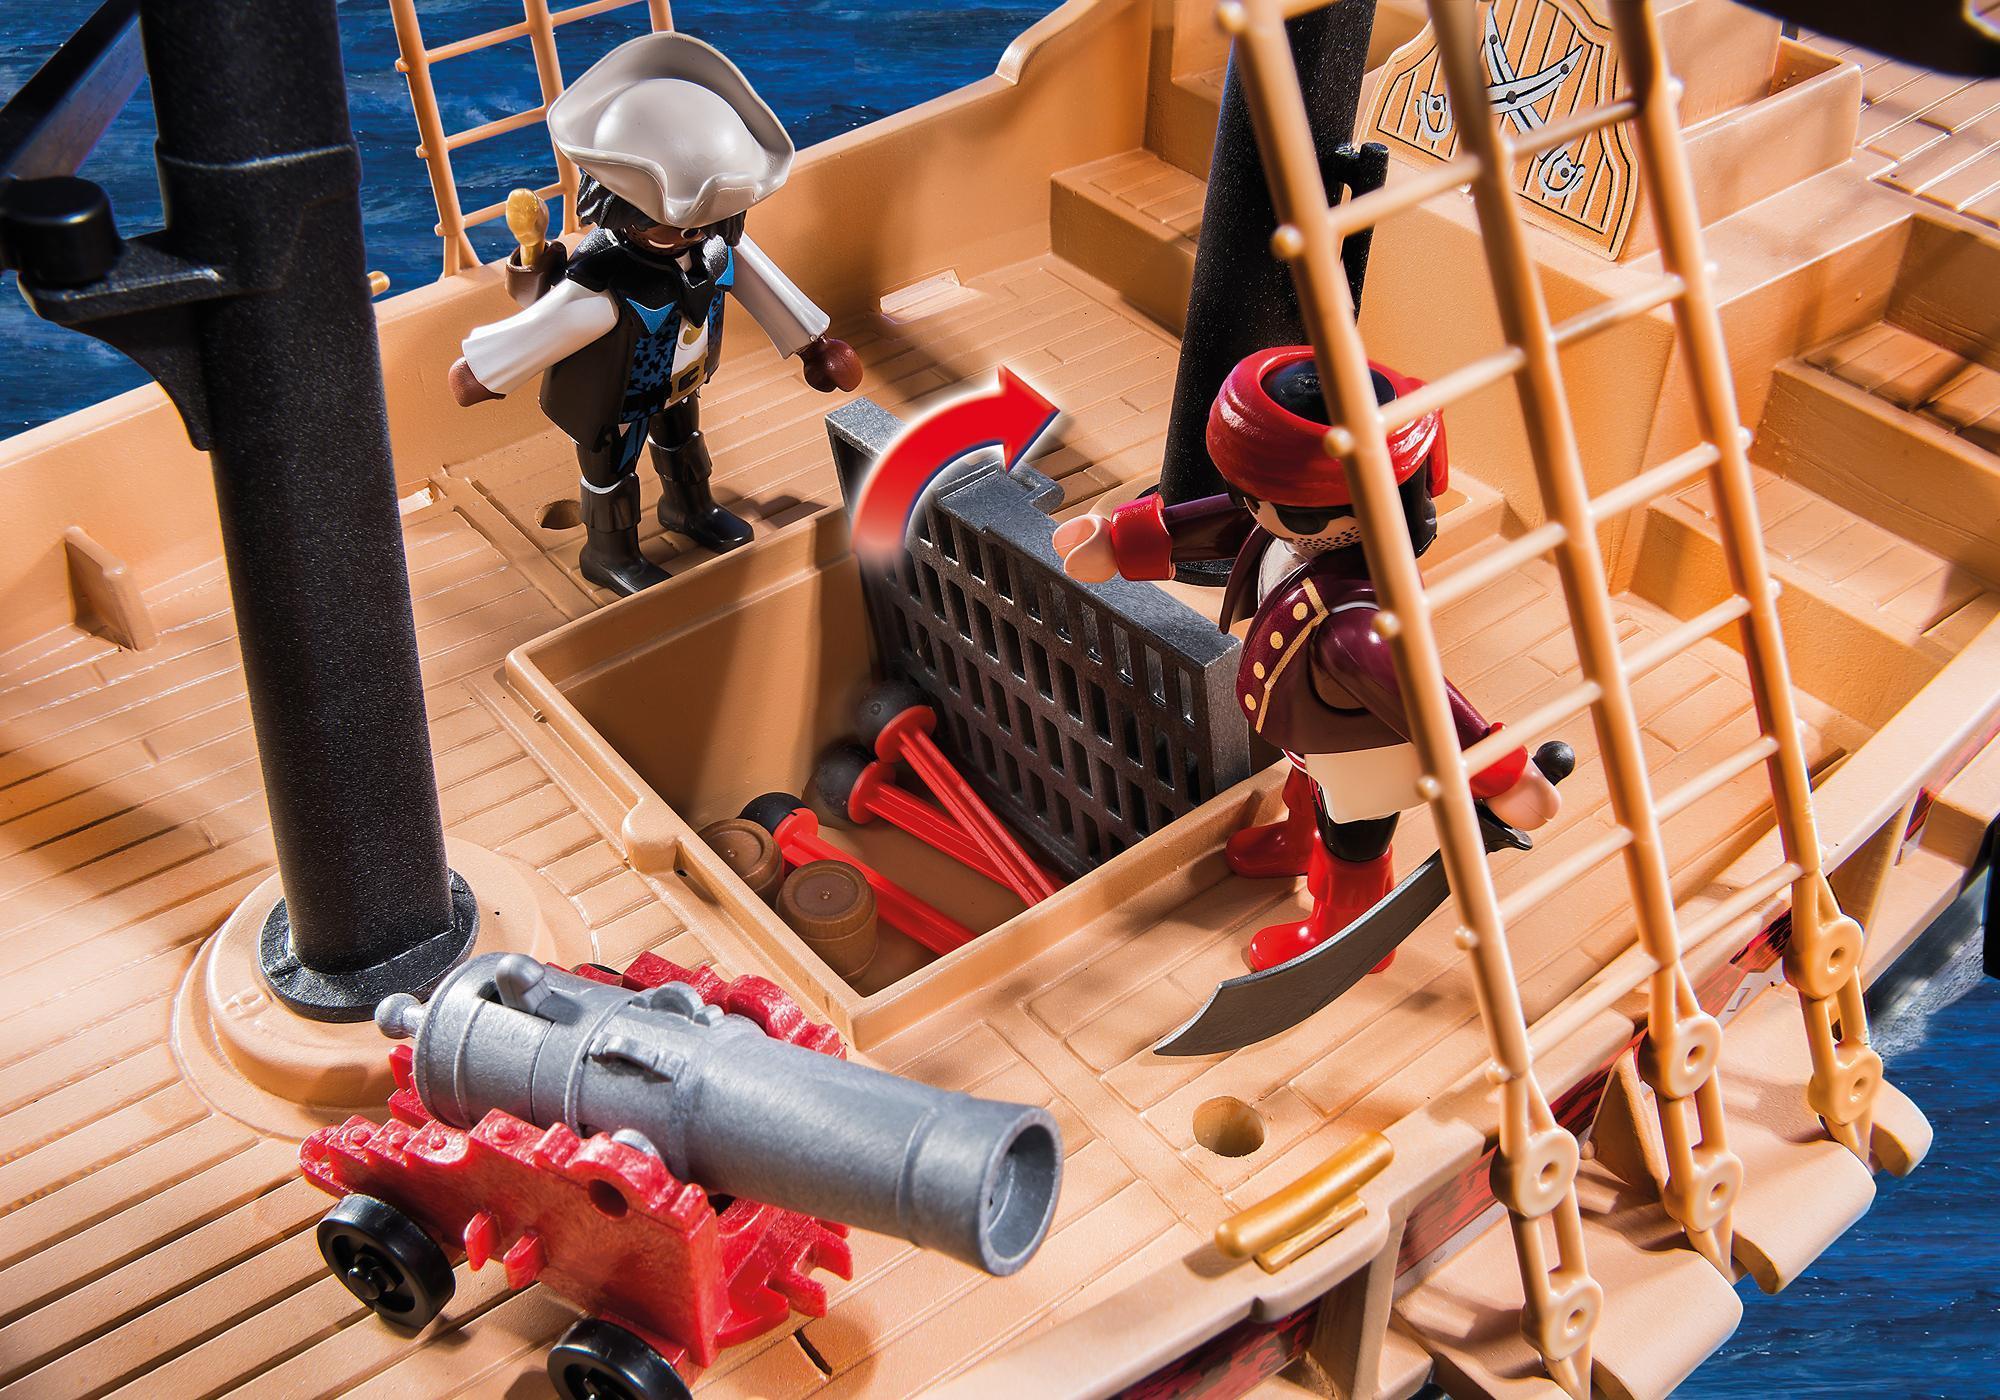 http://media.playmobil.com/i/playmobil/6678_product_extra2/Pirate Raiders' Ship